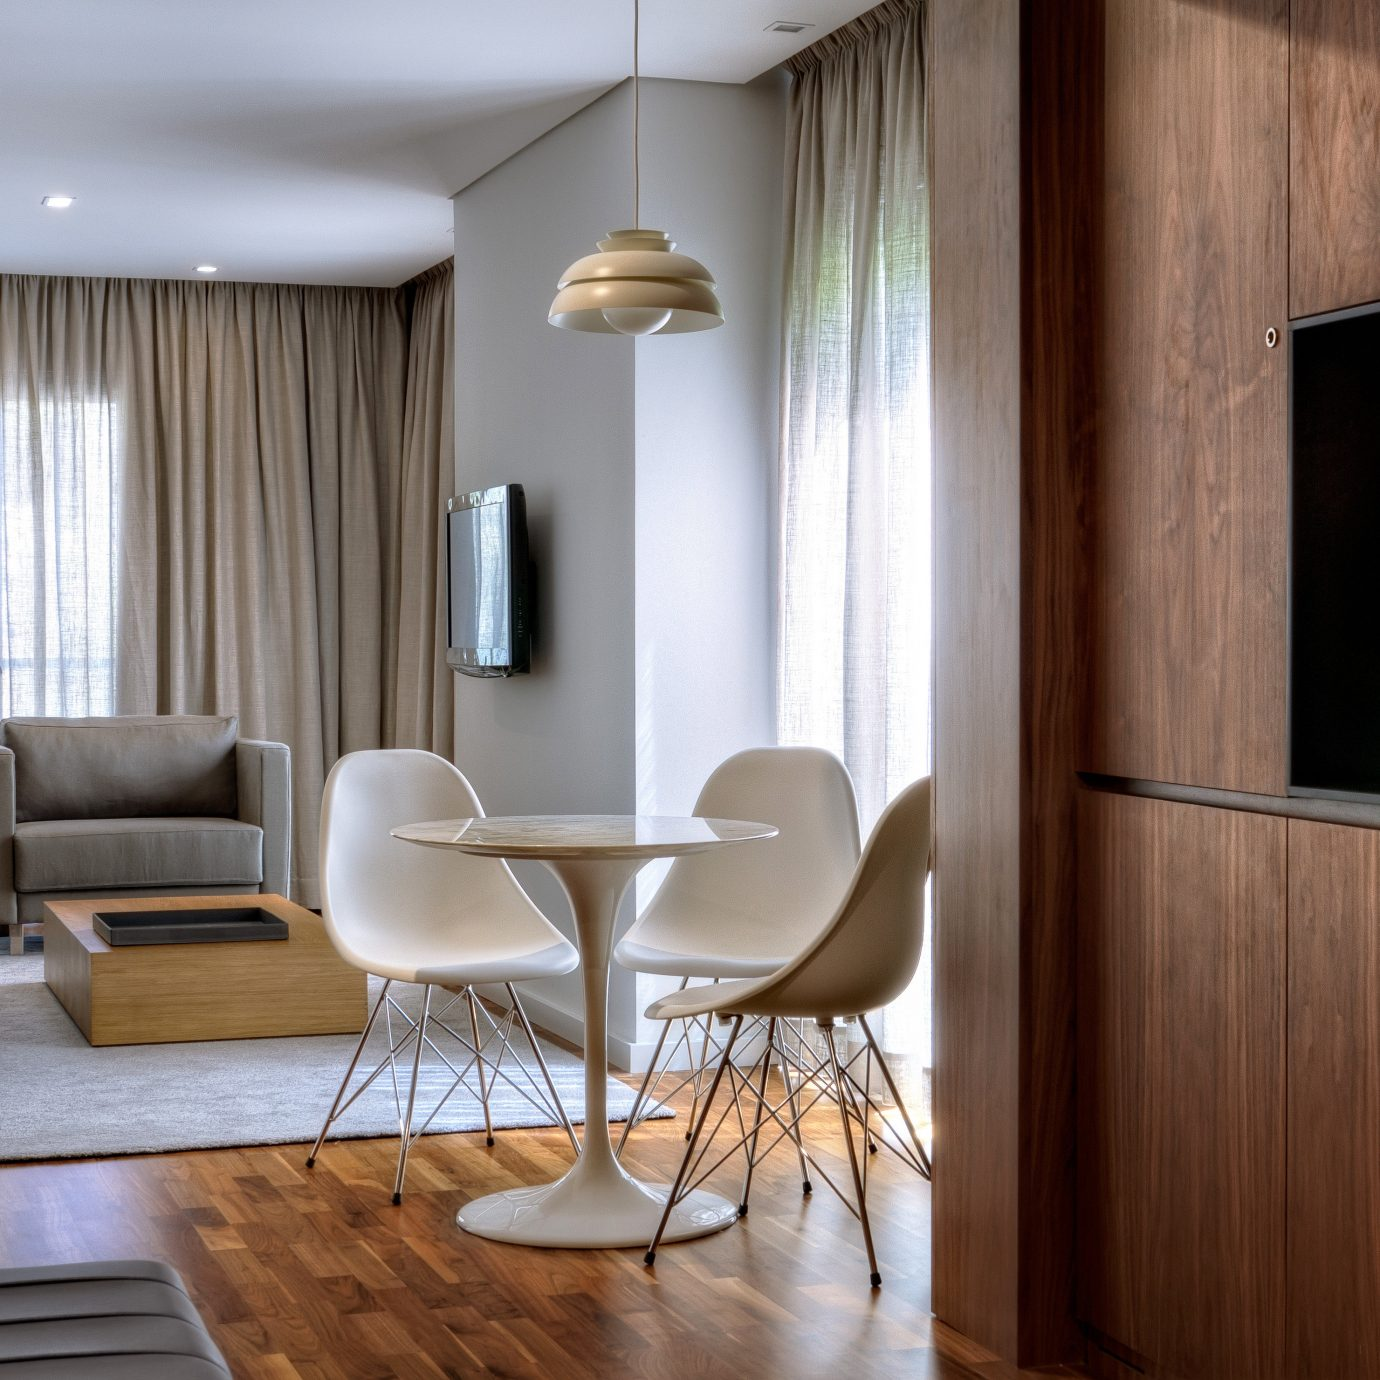 Lounge Modern Suite living room property home hardwood lighting condominium flat dining table